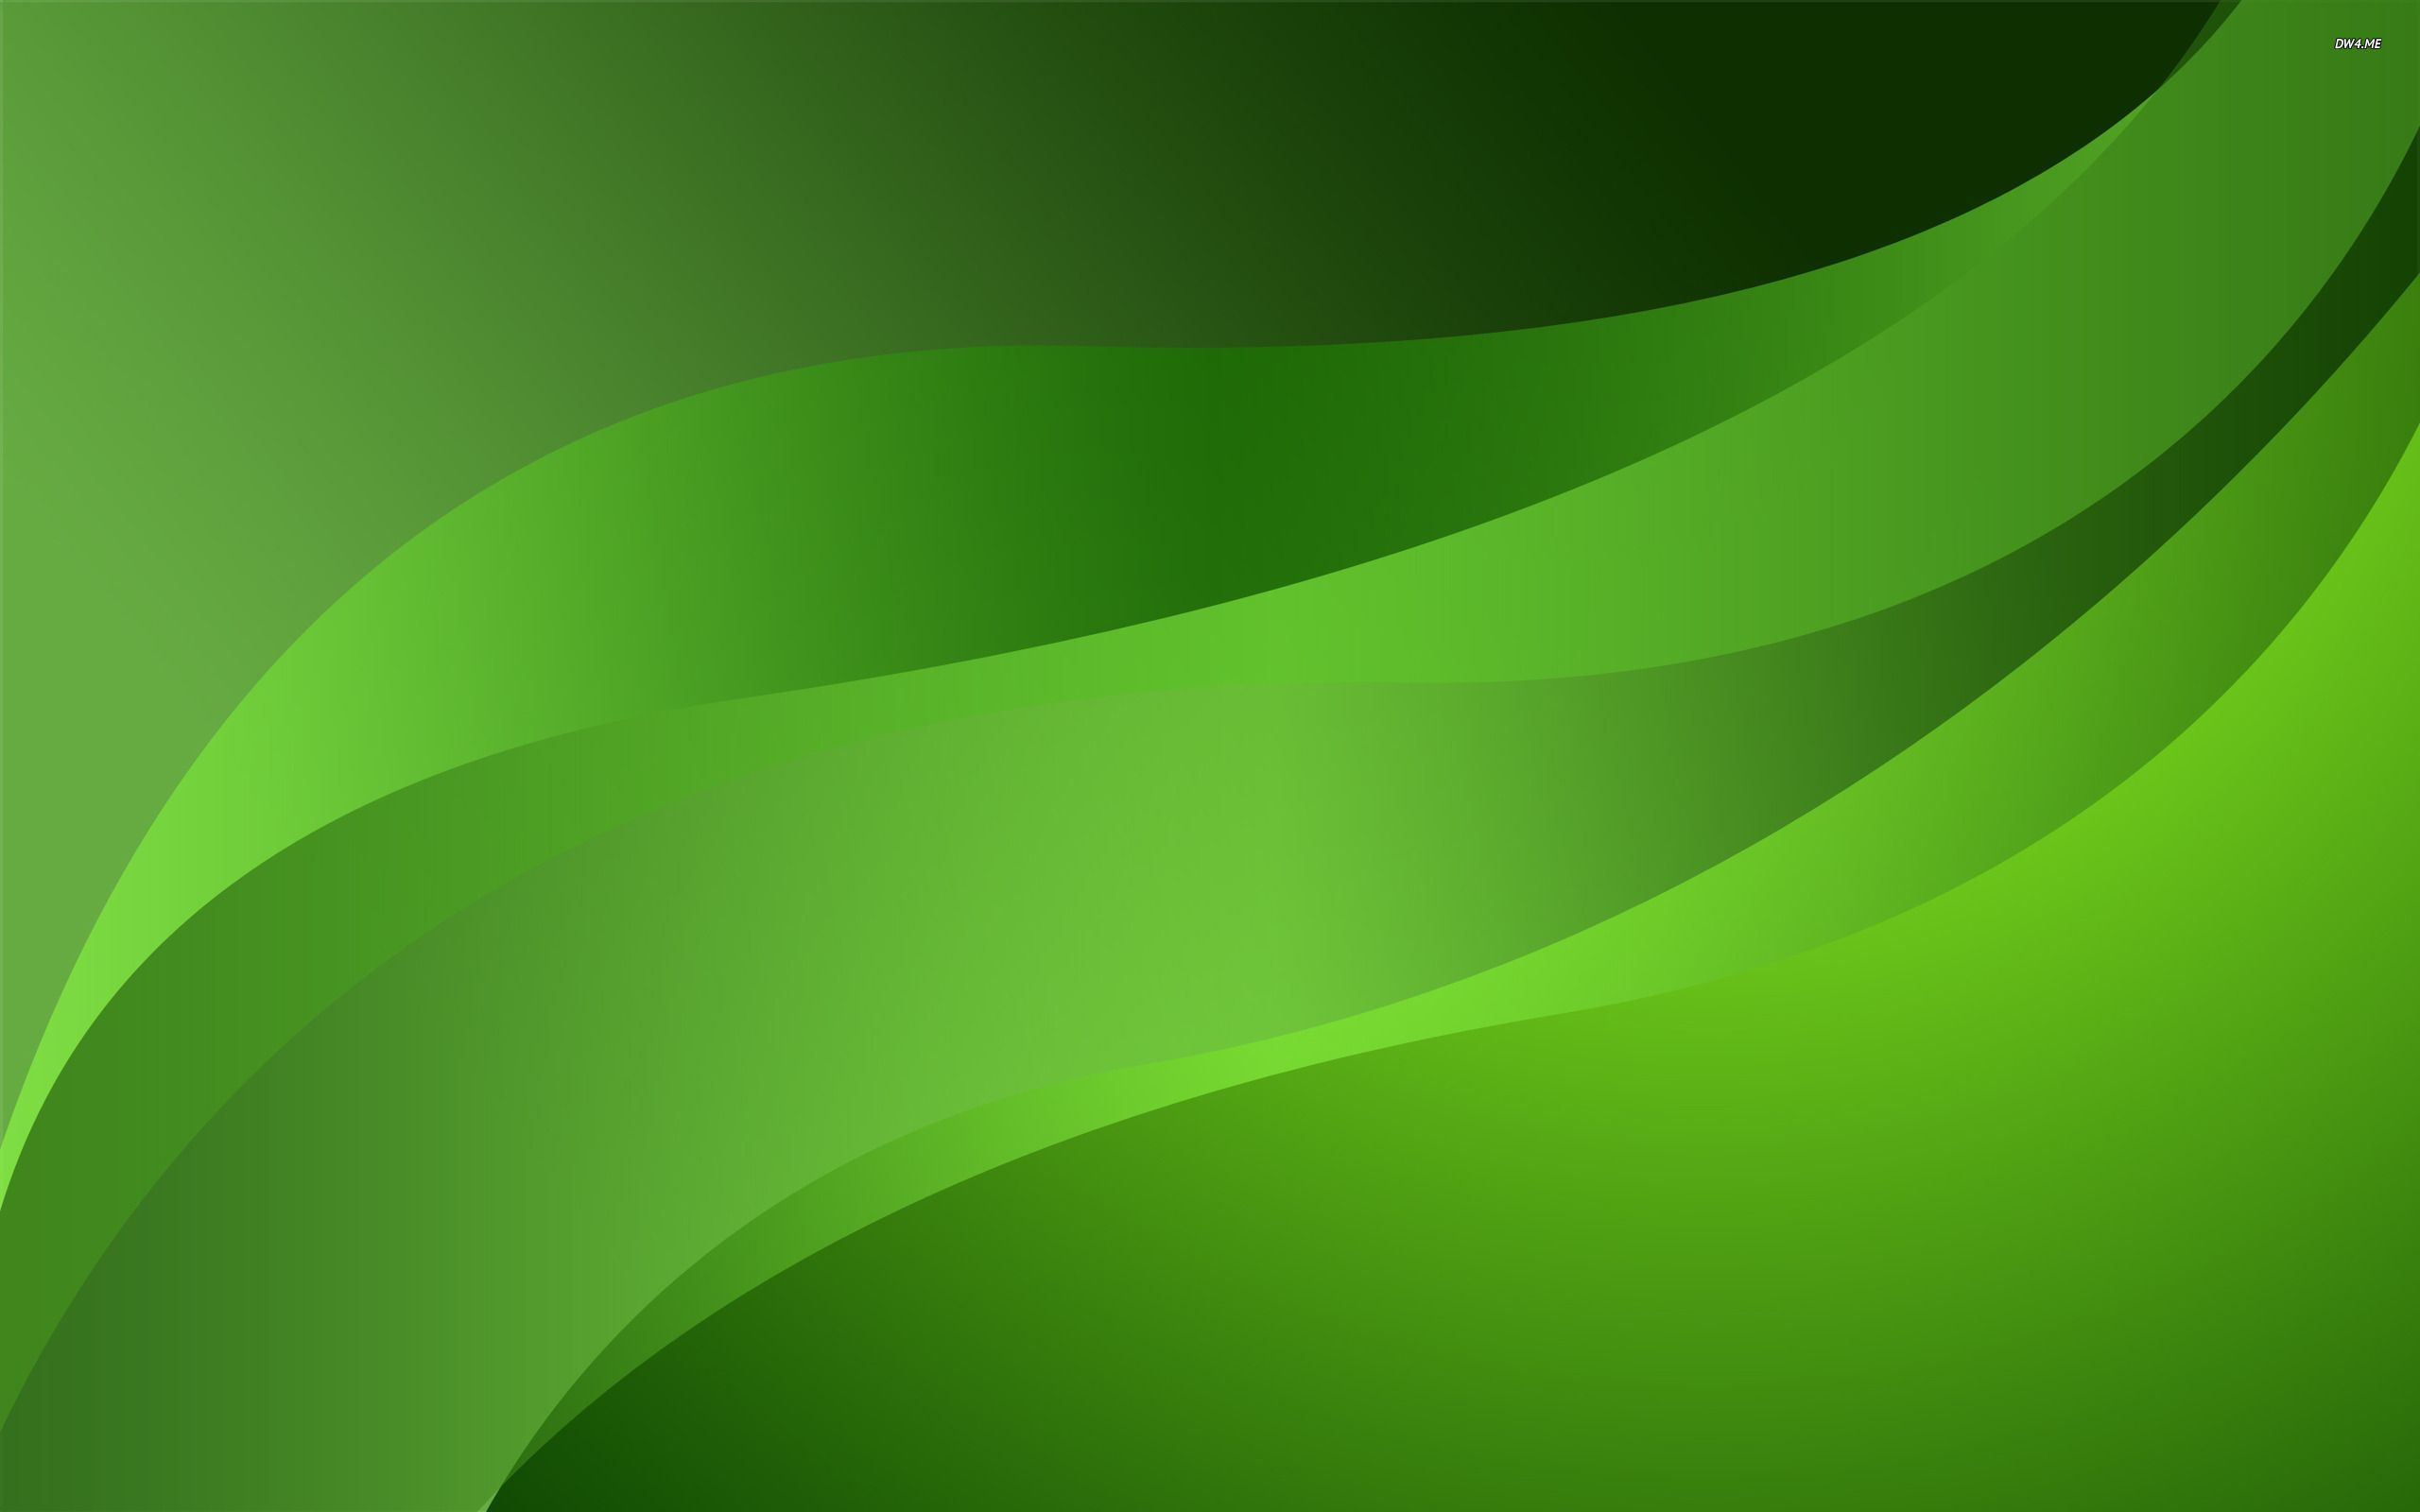 Green High Quality Wallpaper   Grün, Moodboard